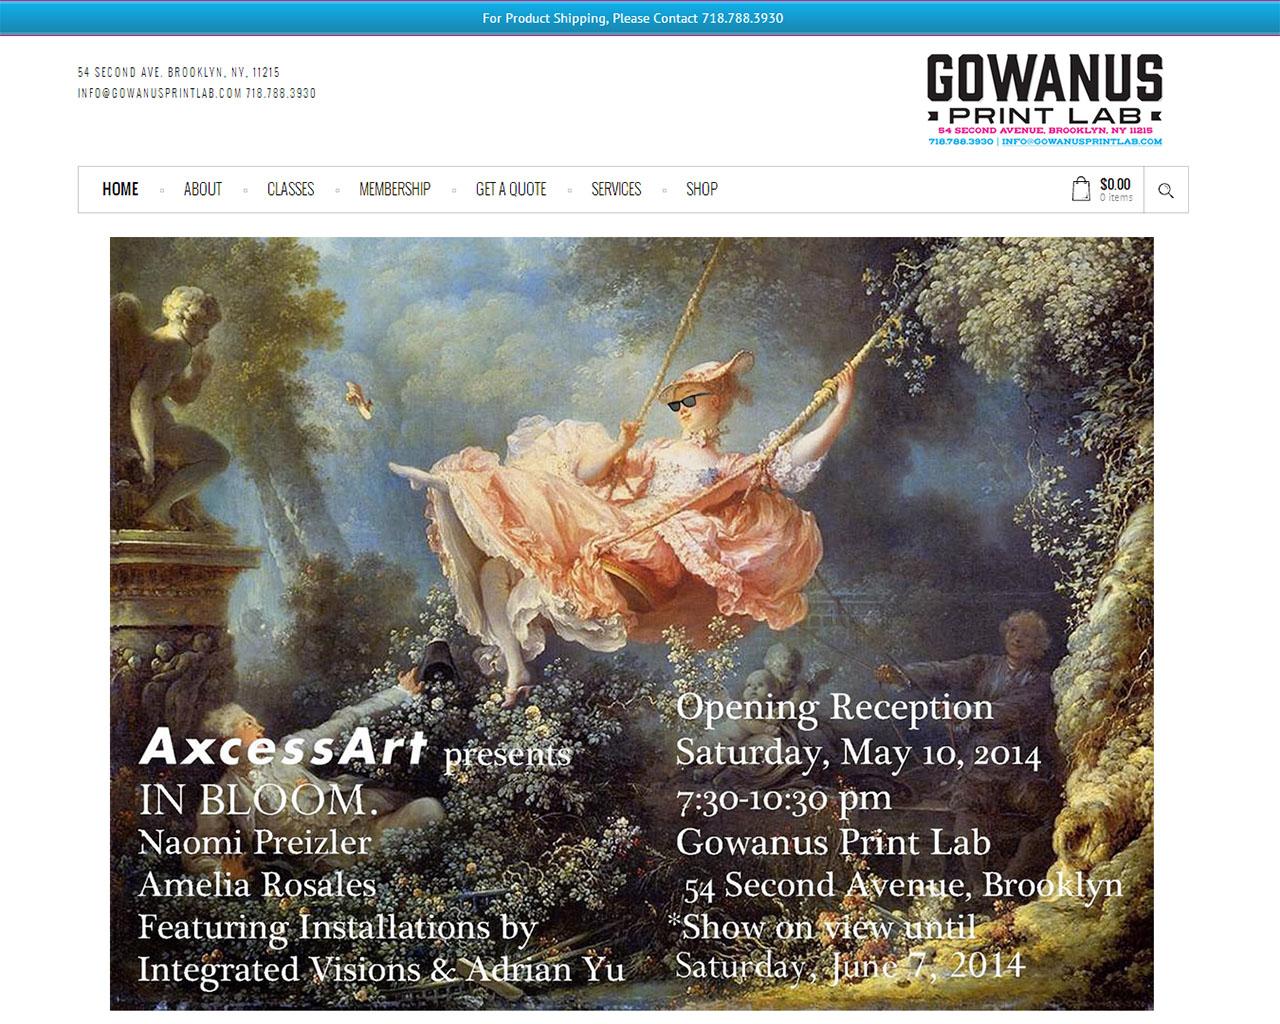 gowanus-print-lab